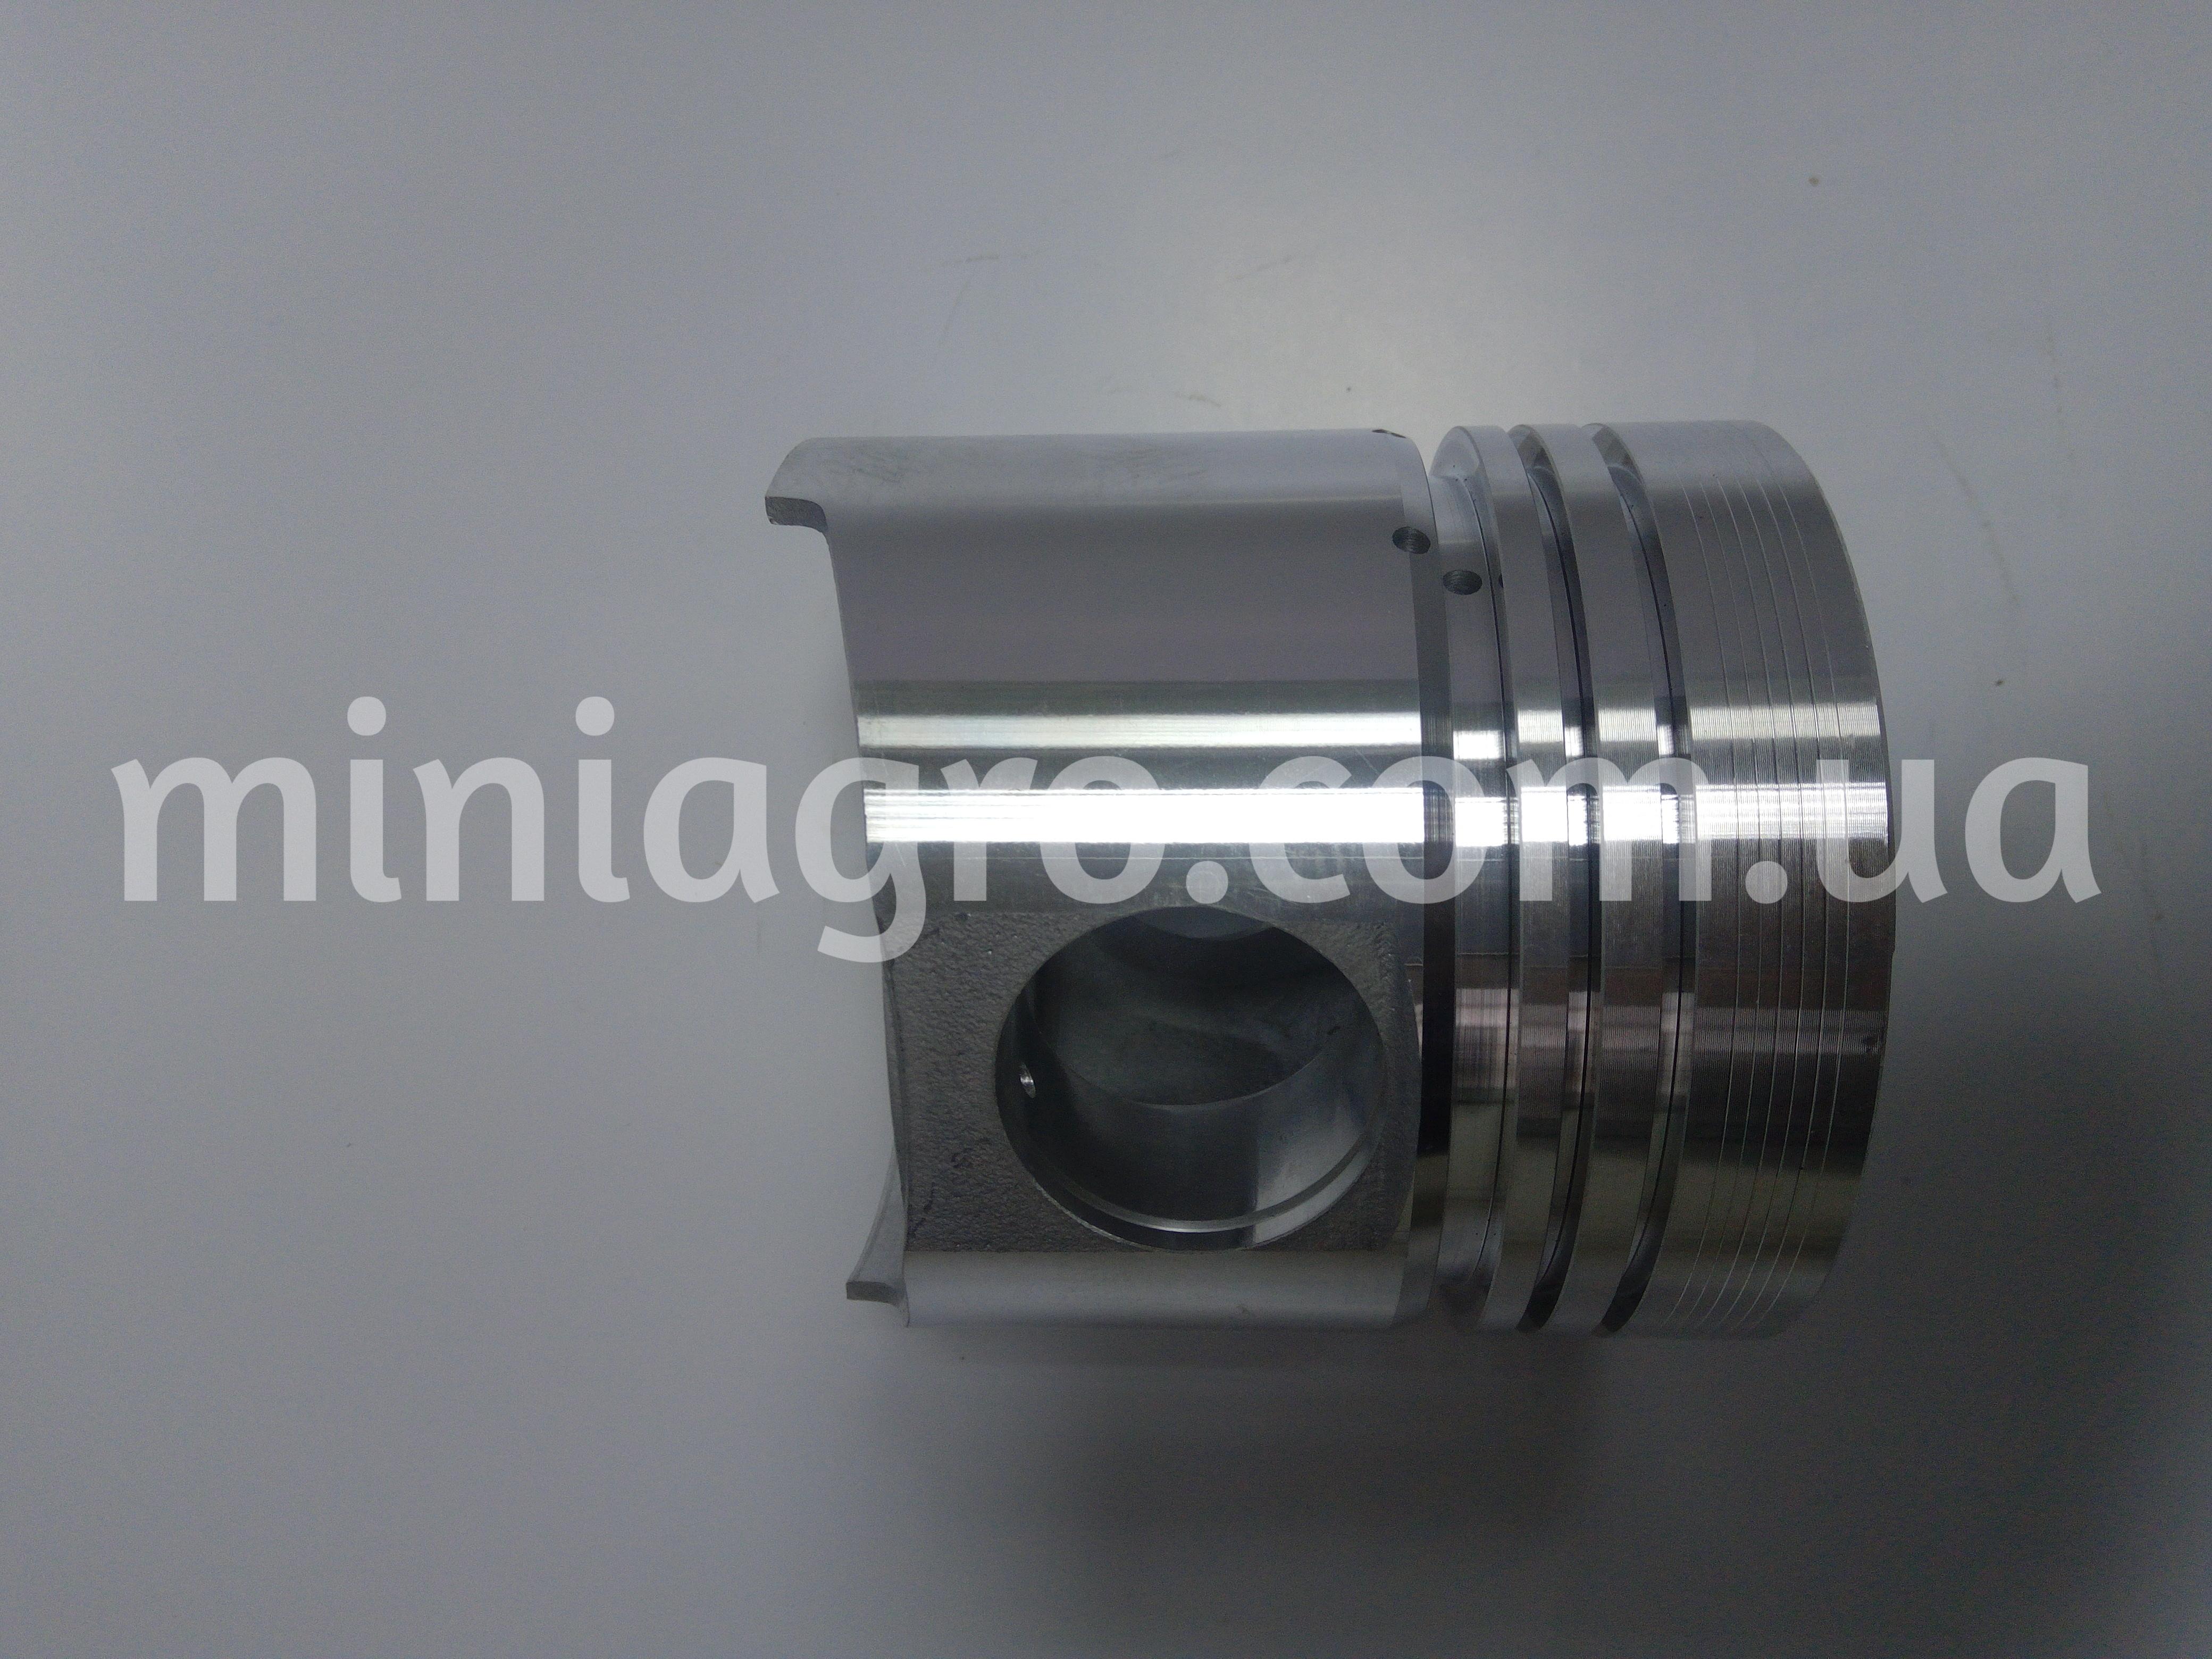 Поршень двигателя TY2100 для мини-трактора XT244